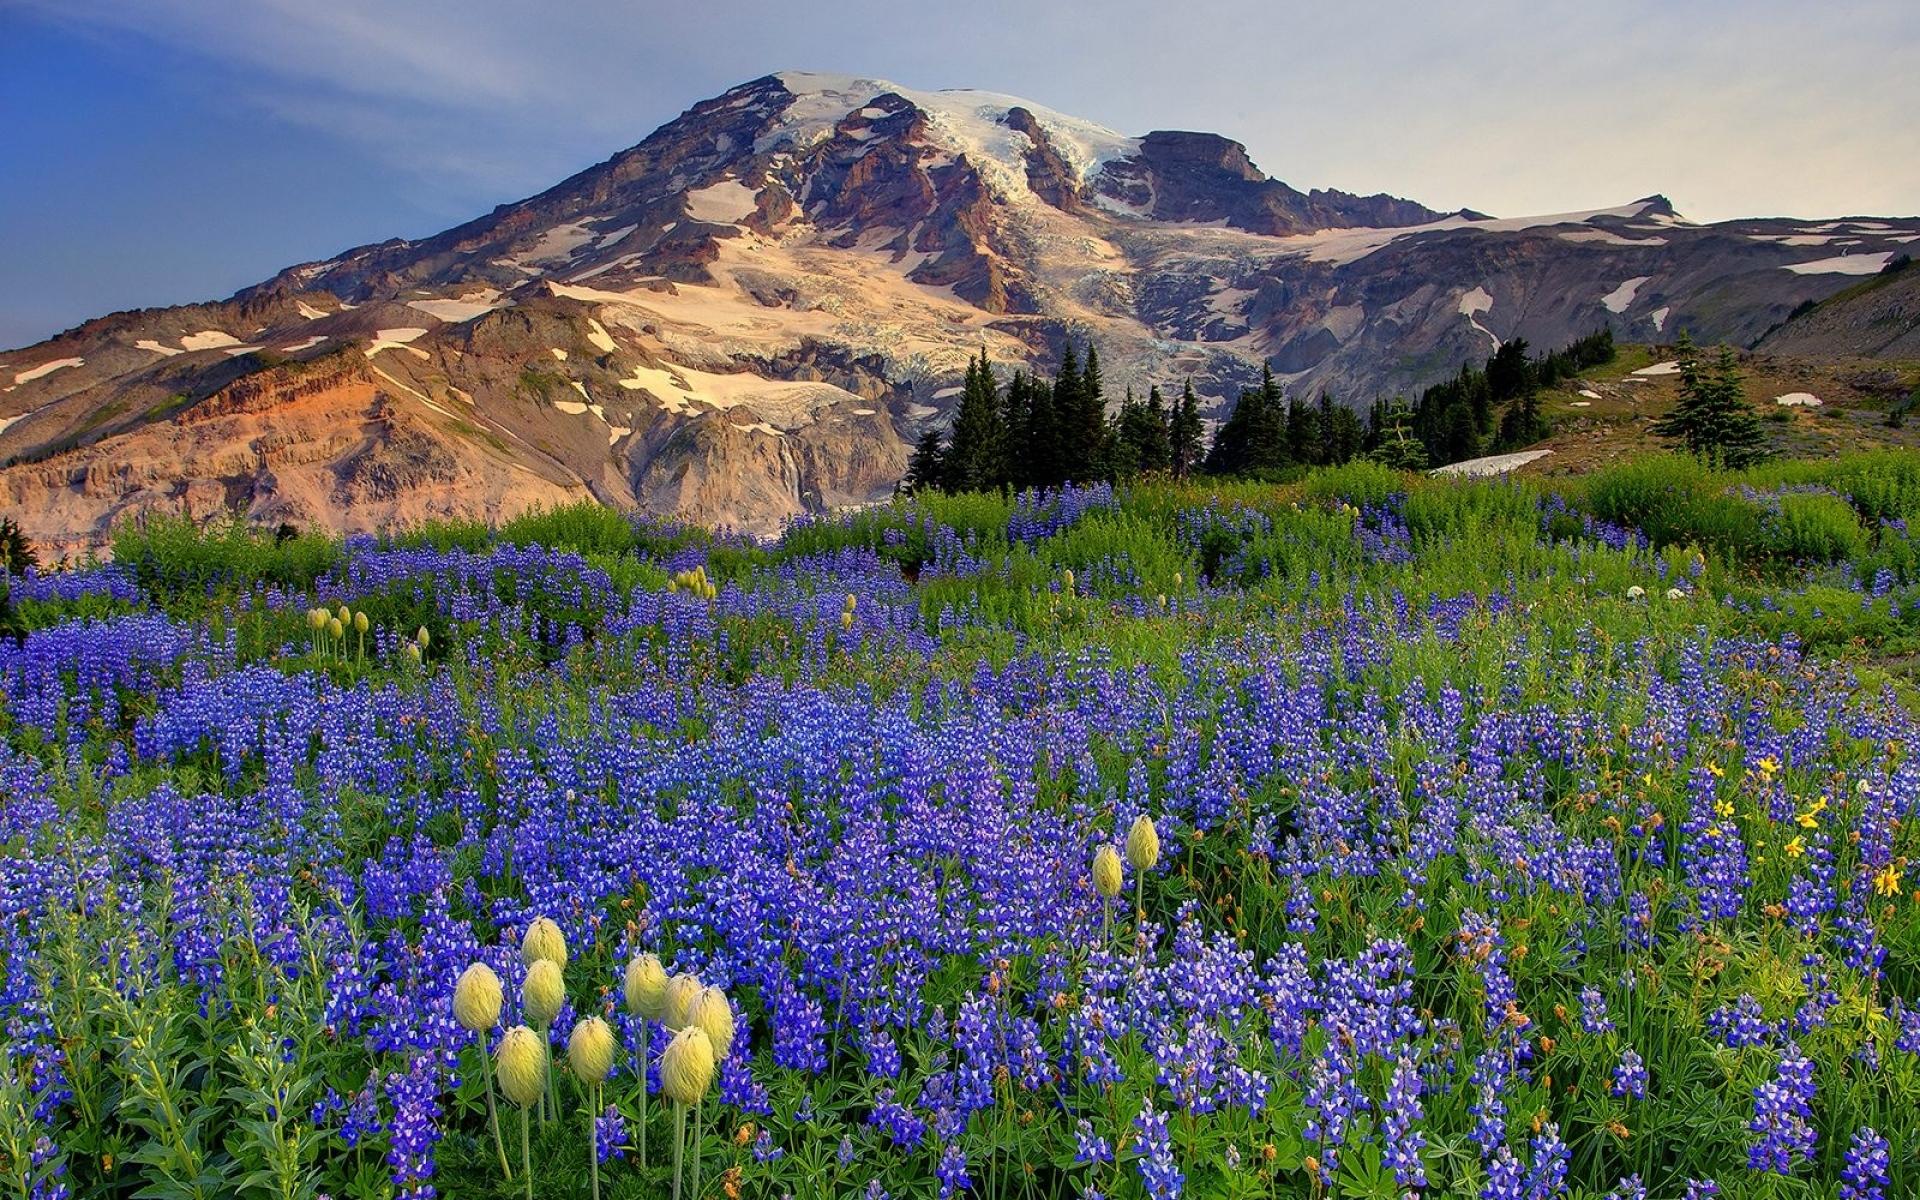 лункевич цветущие горы картинка материал